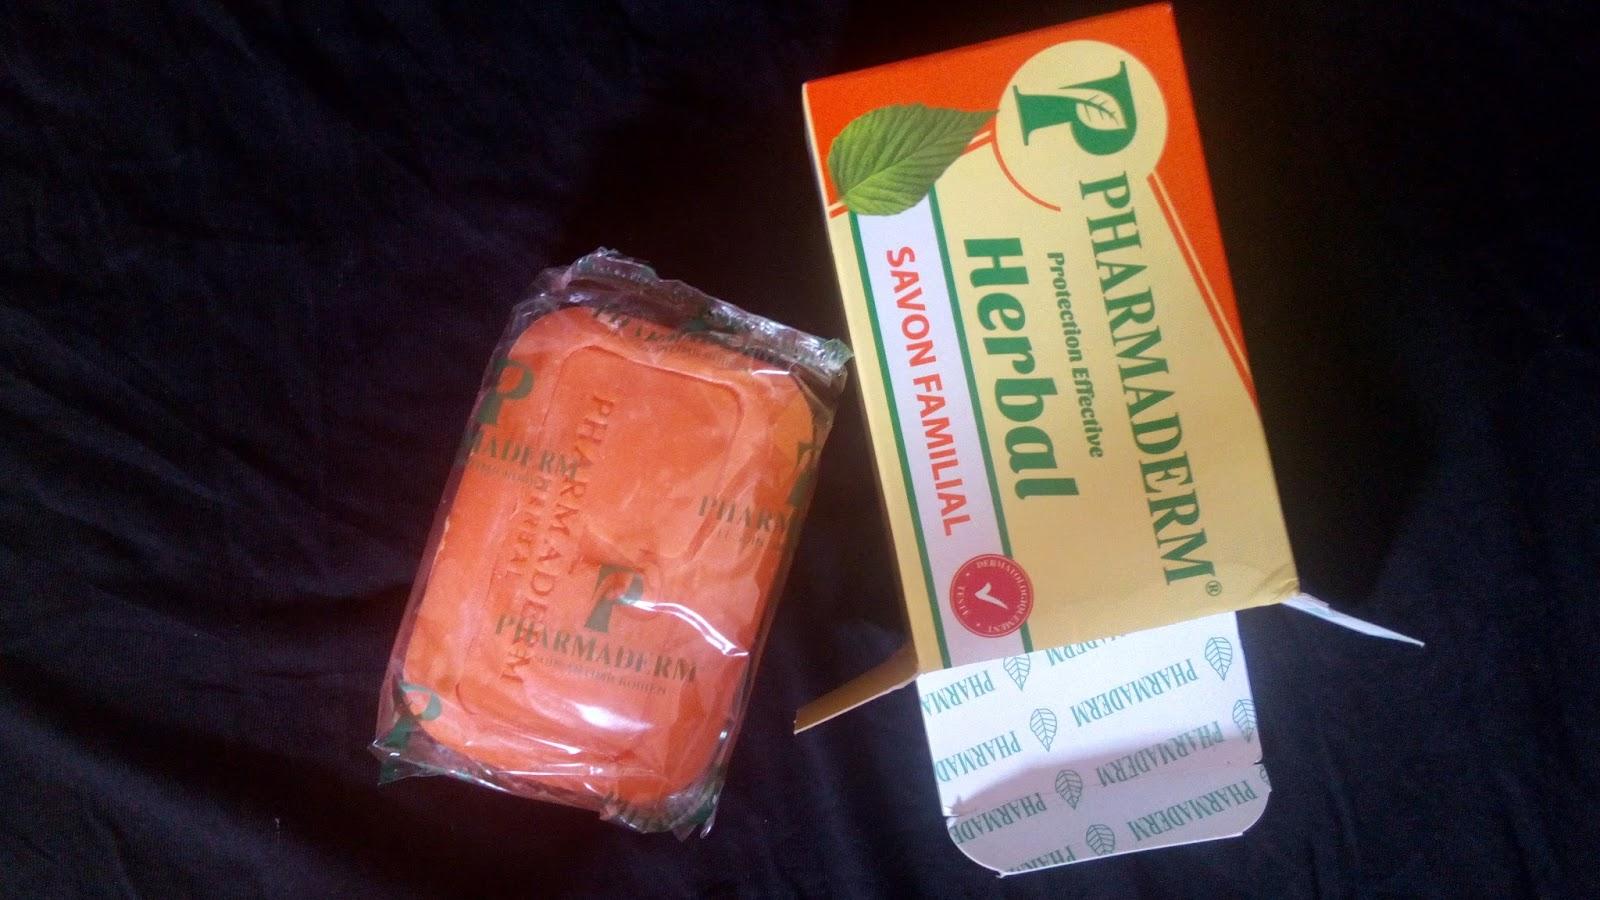 pharmaderm antiseptic soap, pharmaderm apricot soap, pharmaderm care soap, pharmaderm cream and soap, pharmaderm exfoliating beauty soap, pharmaderm herbal family soap, pharmaderm herbal soap, pharmaderm soap, pharmaderm soap for acne, pharmaderm soap for pimples, pharmaderm soap reviews